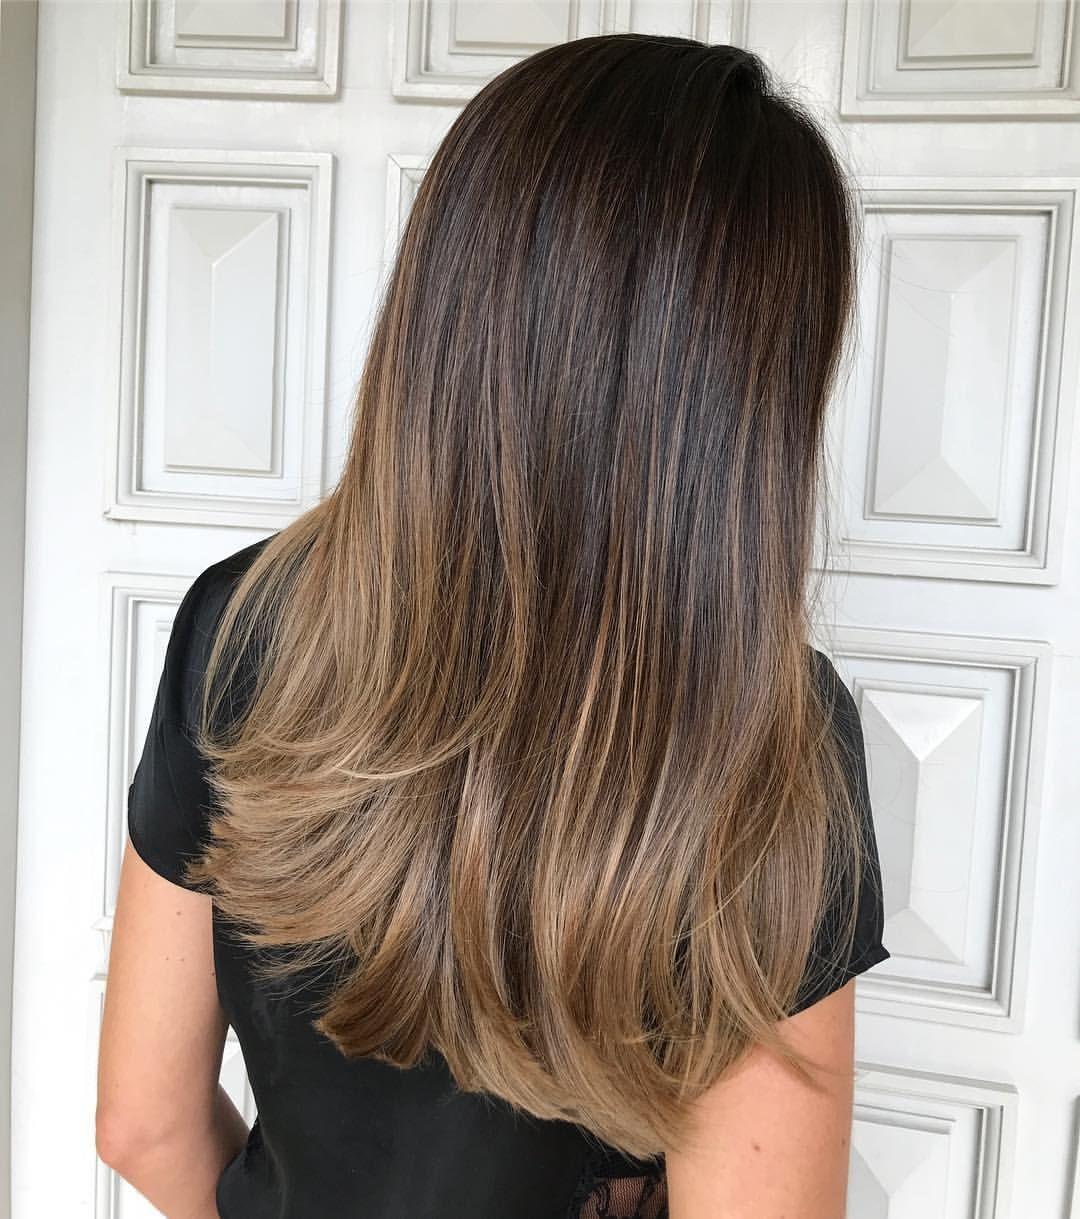 Pin De Desirae Morales Em Hair Makeup Nail Cabelo Morenas Luzes Cabelo Cabelo Longo